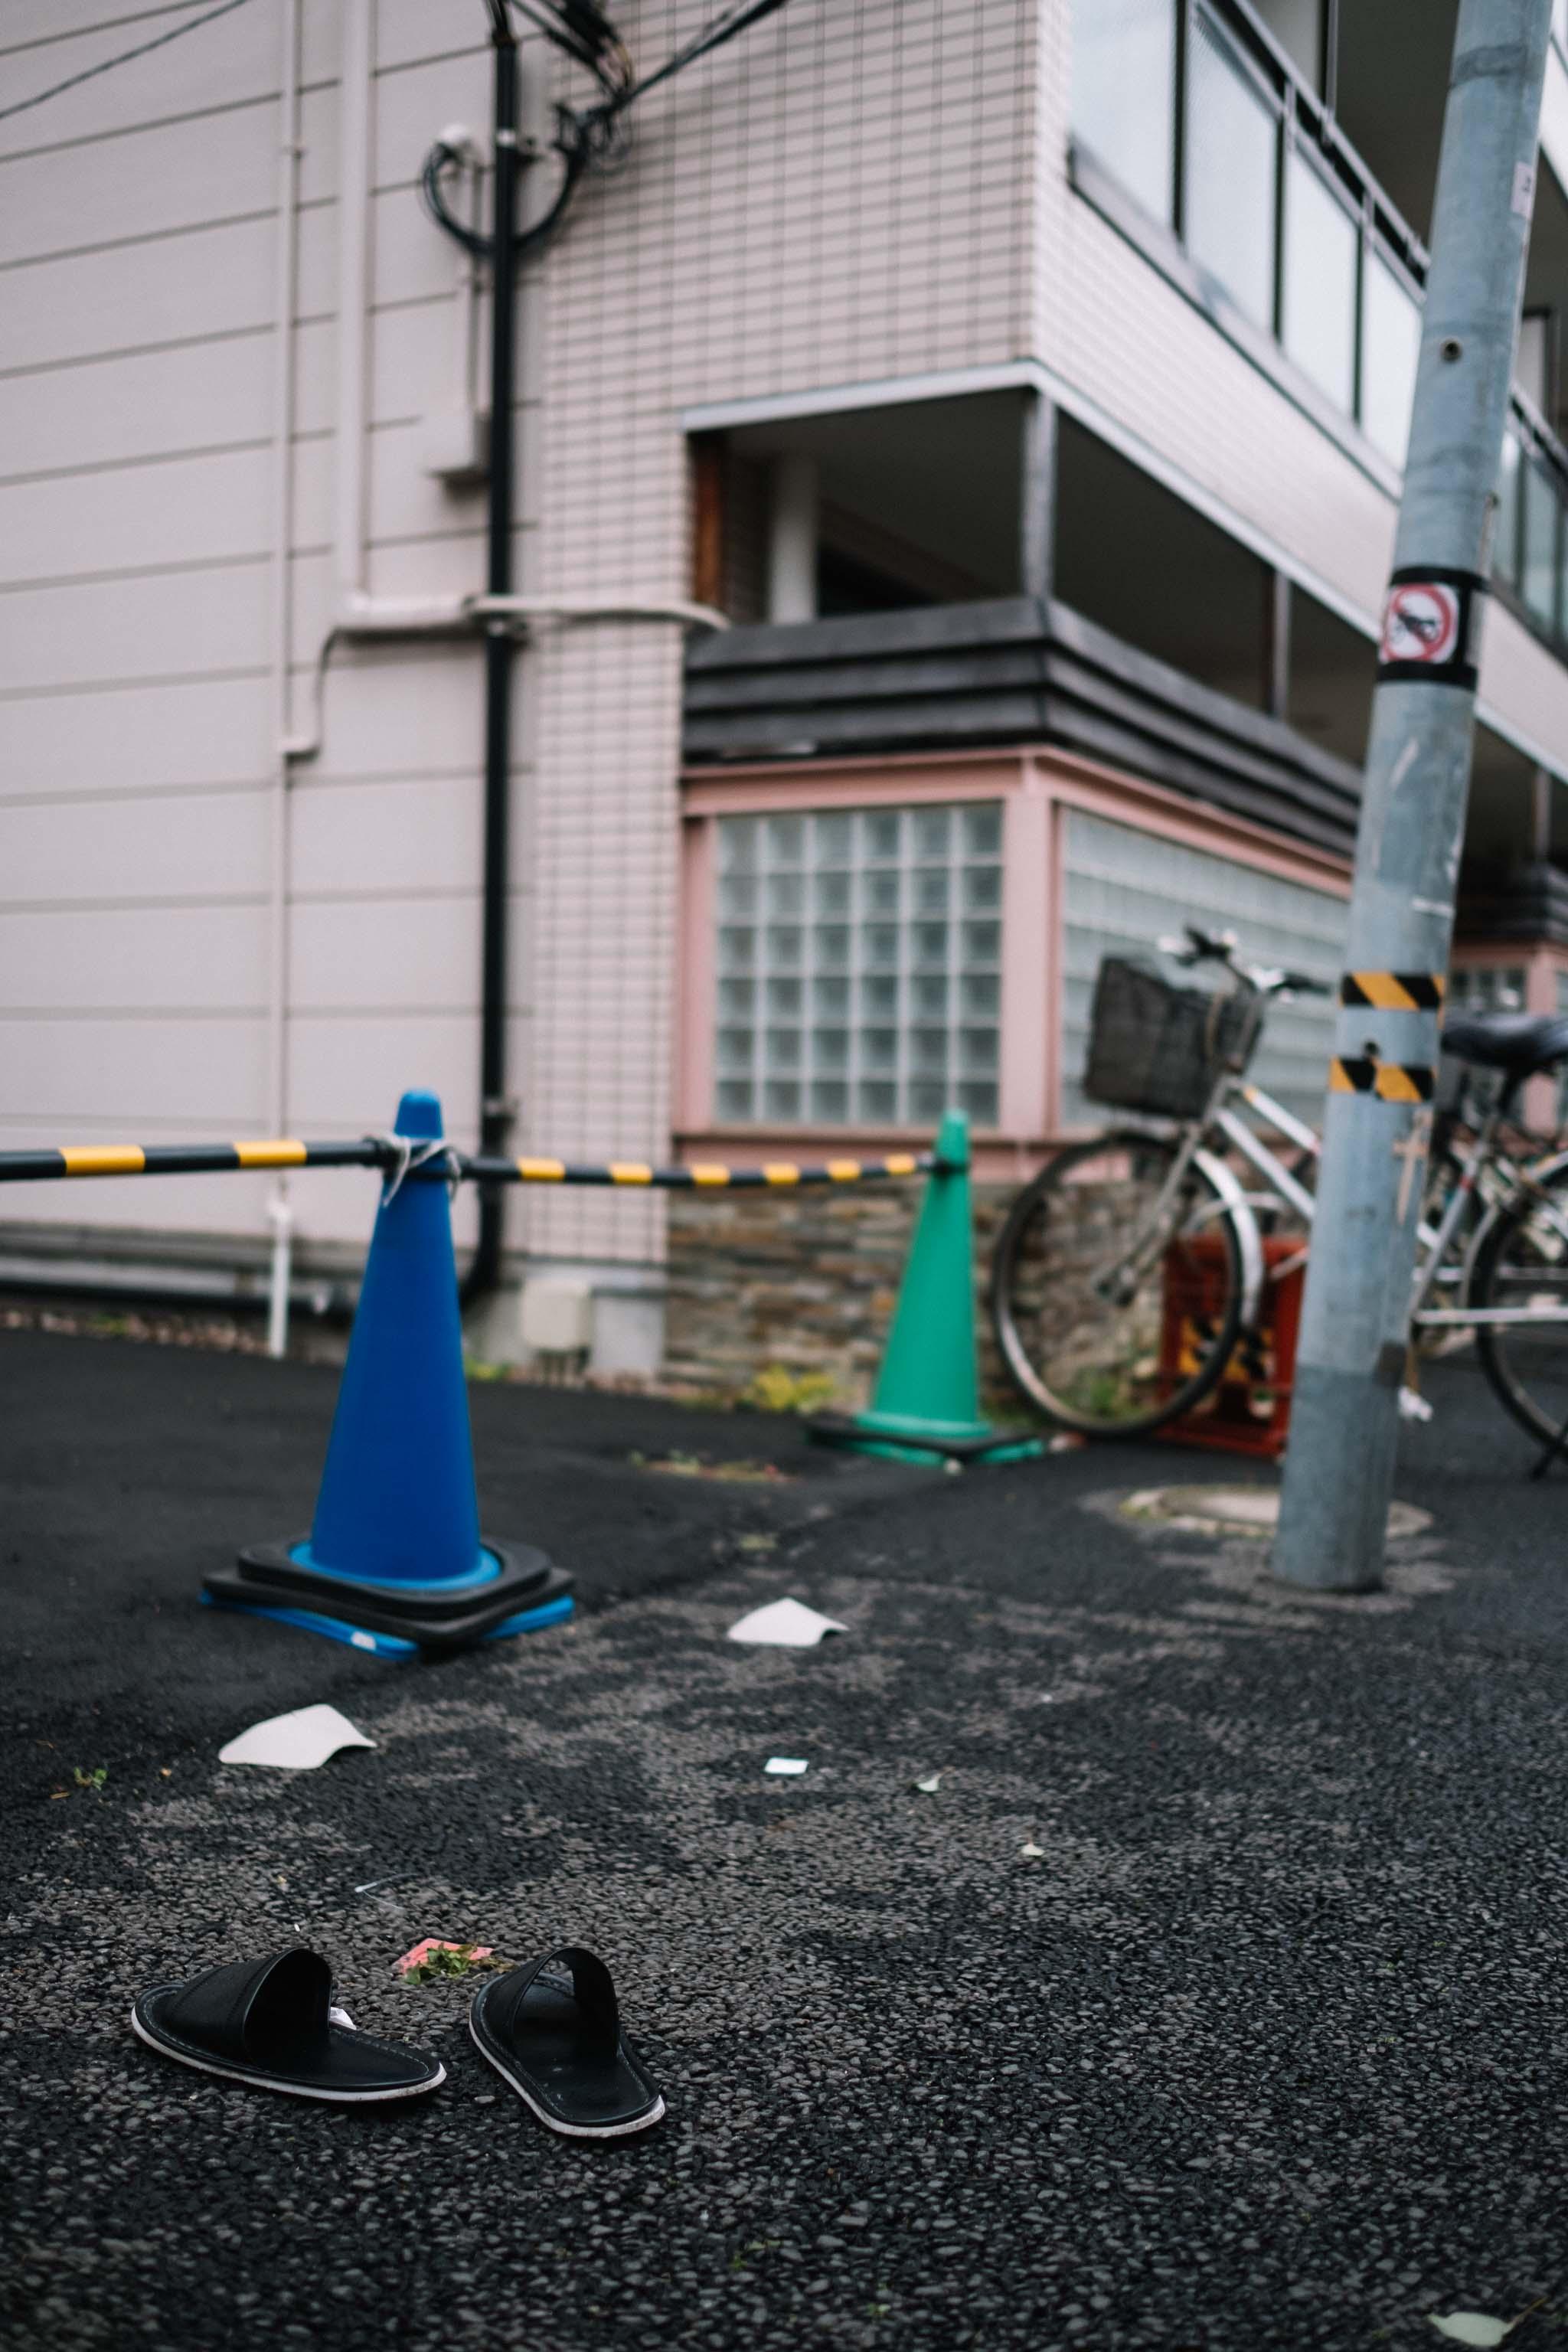 chris_eberhardt_japan_travel_reise_nippon-1.jpg